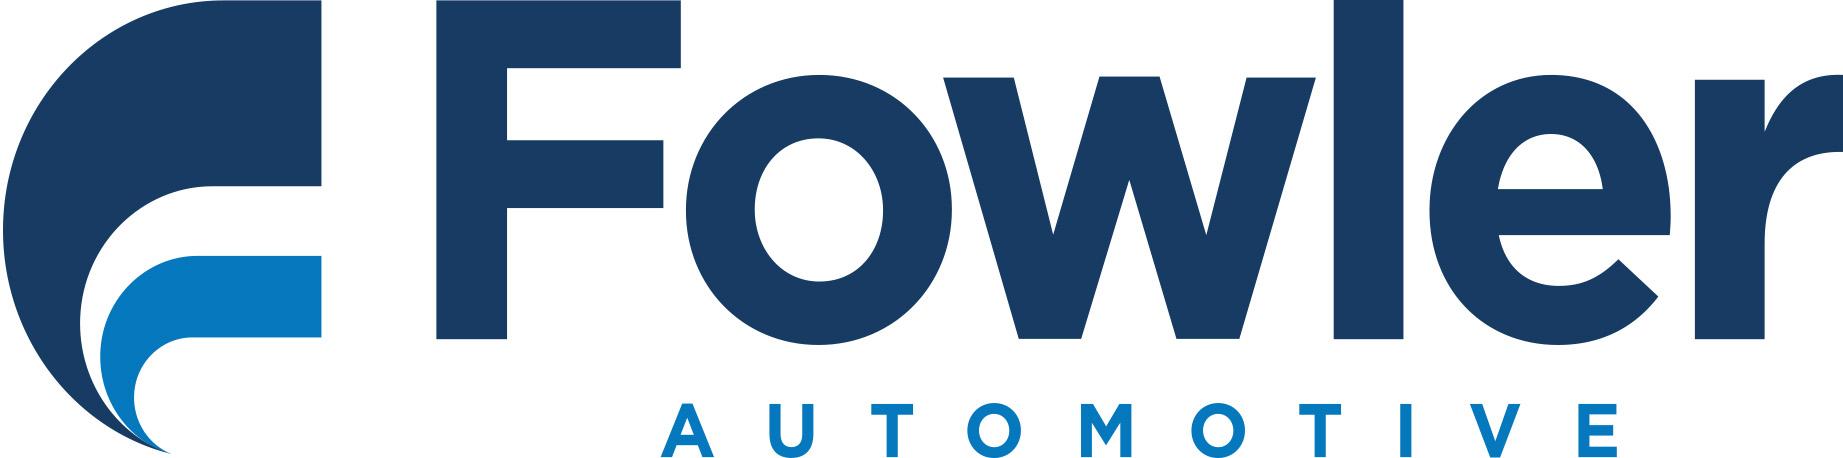 Fowler Automotive